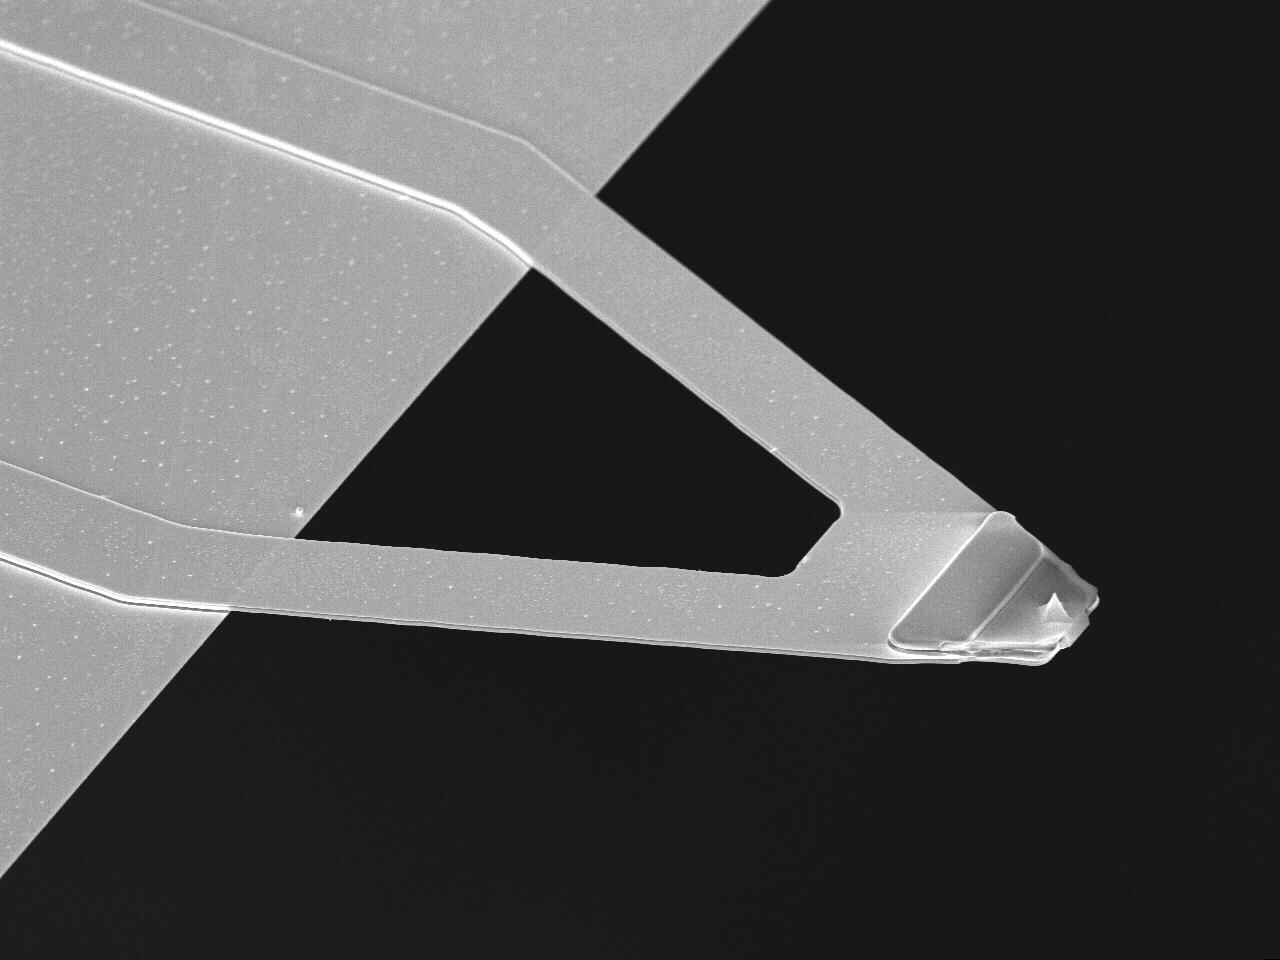 VScan-Airプローブ